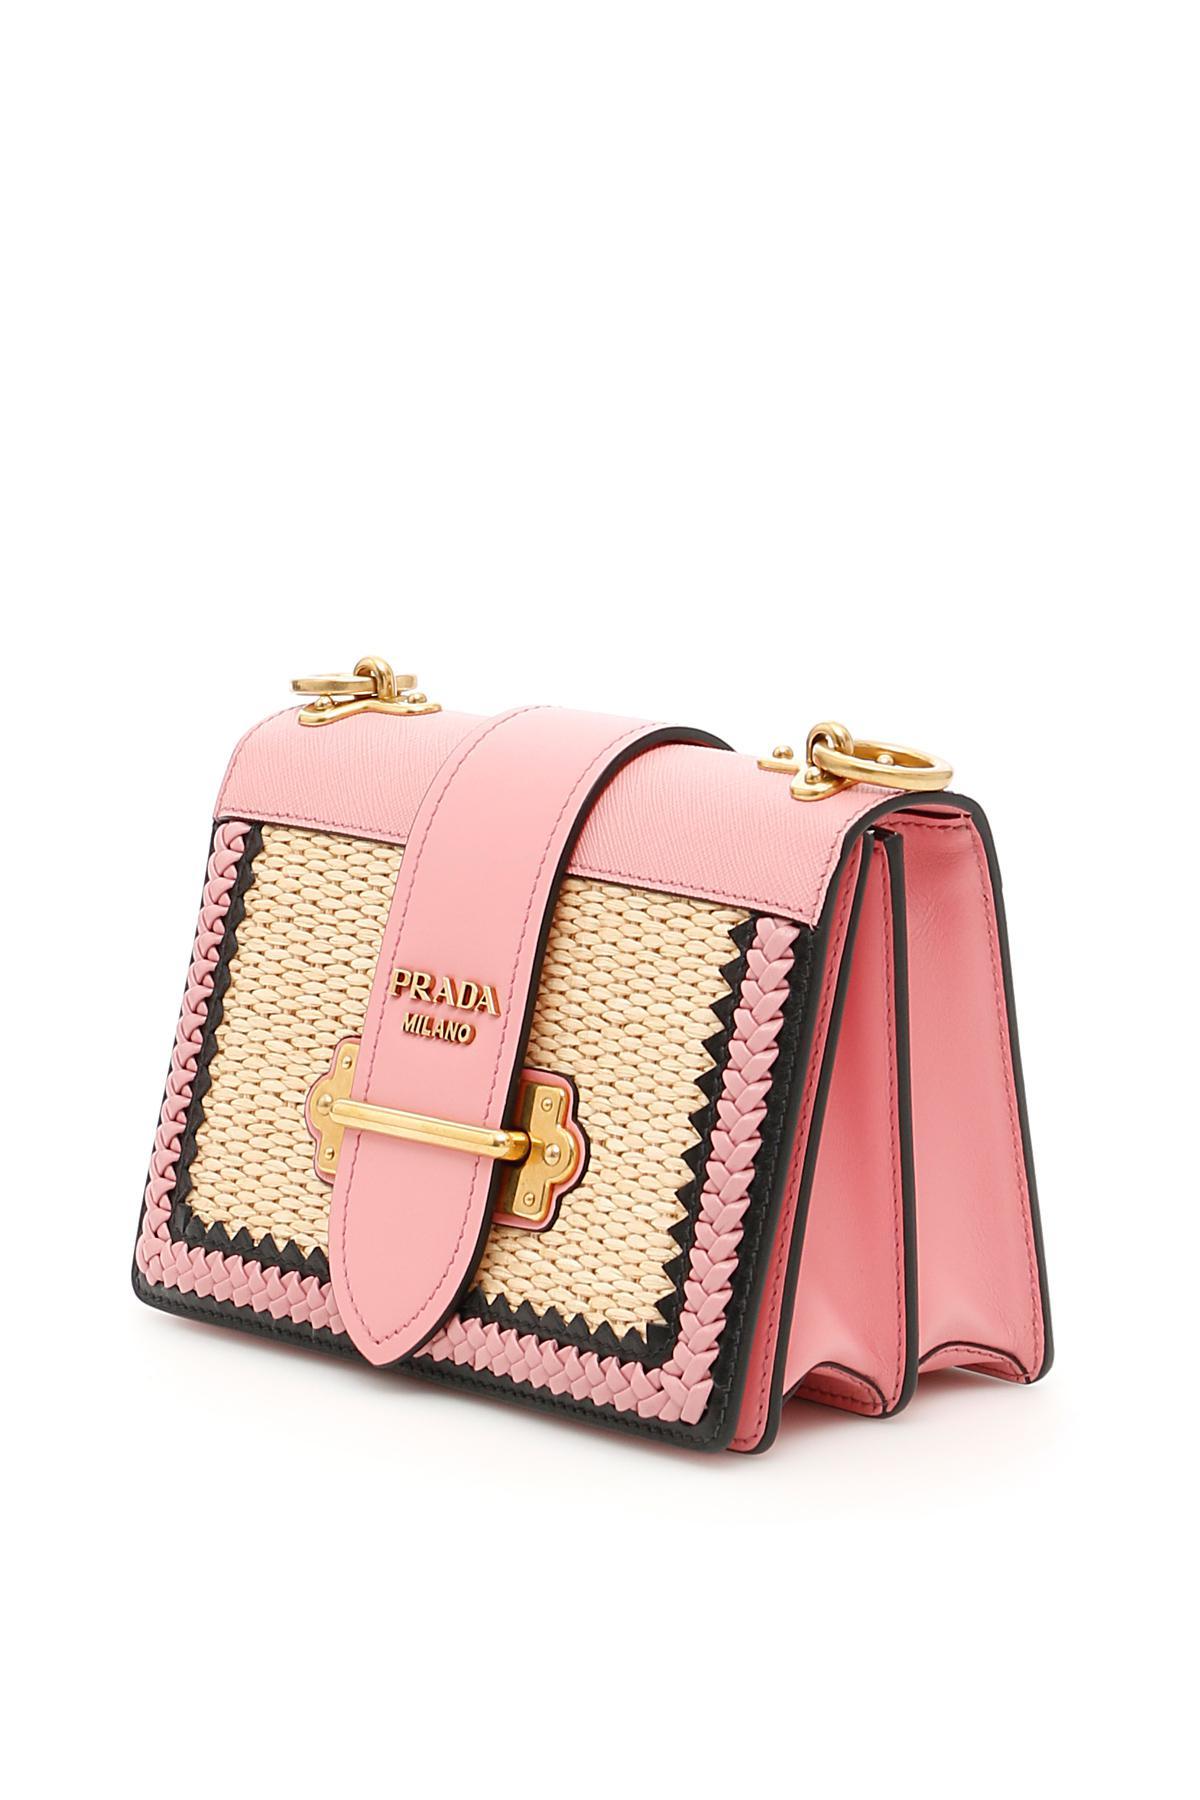 a047a0019b79 ... wholesale prada pink calfskin and straw cahier bag lyst. view  fullscreen 732e1 ecd32